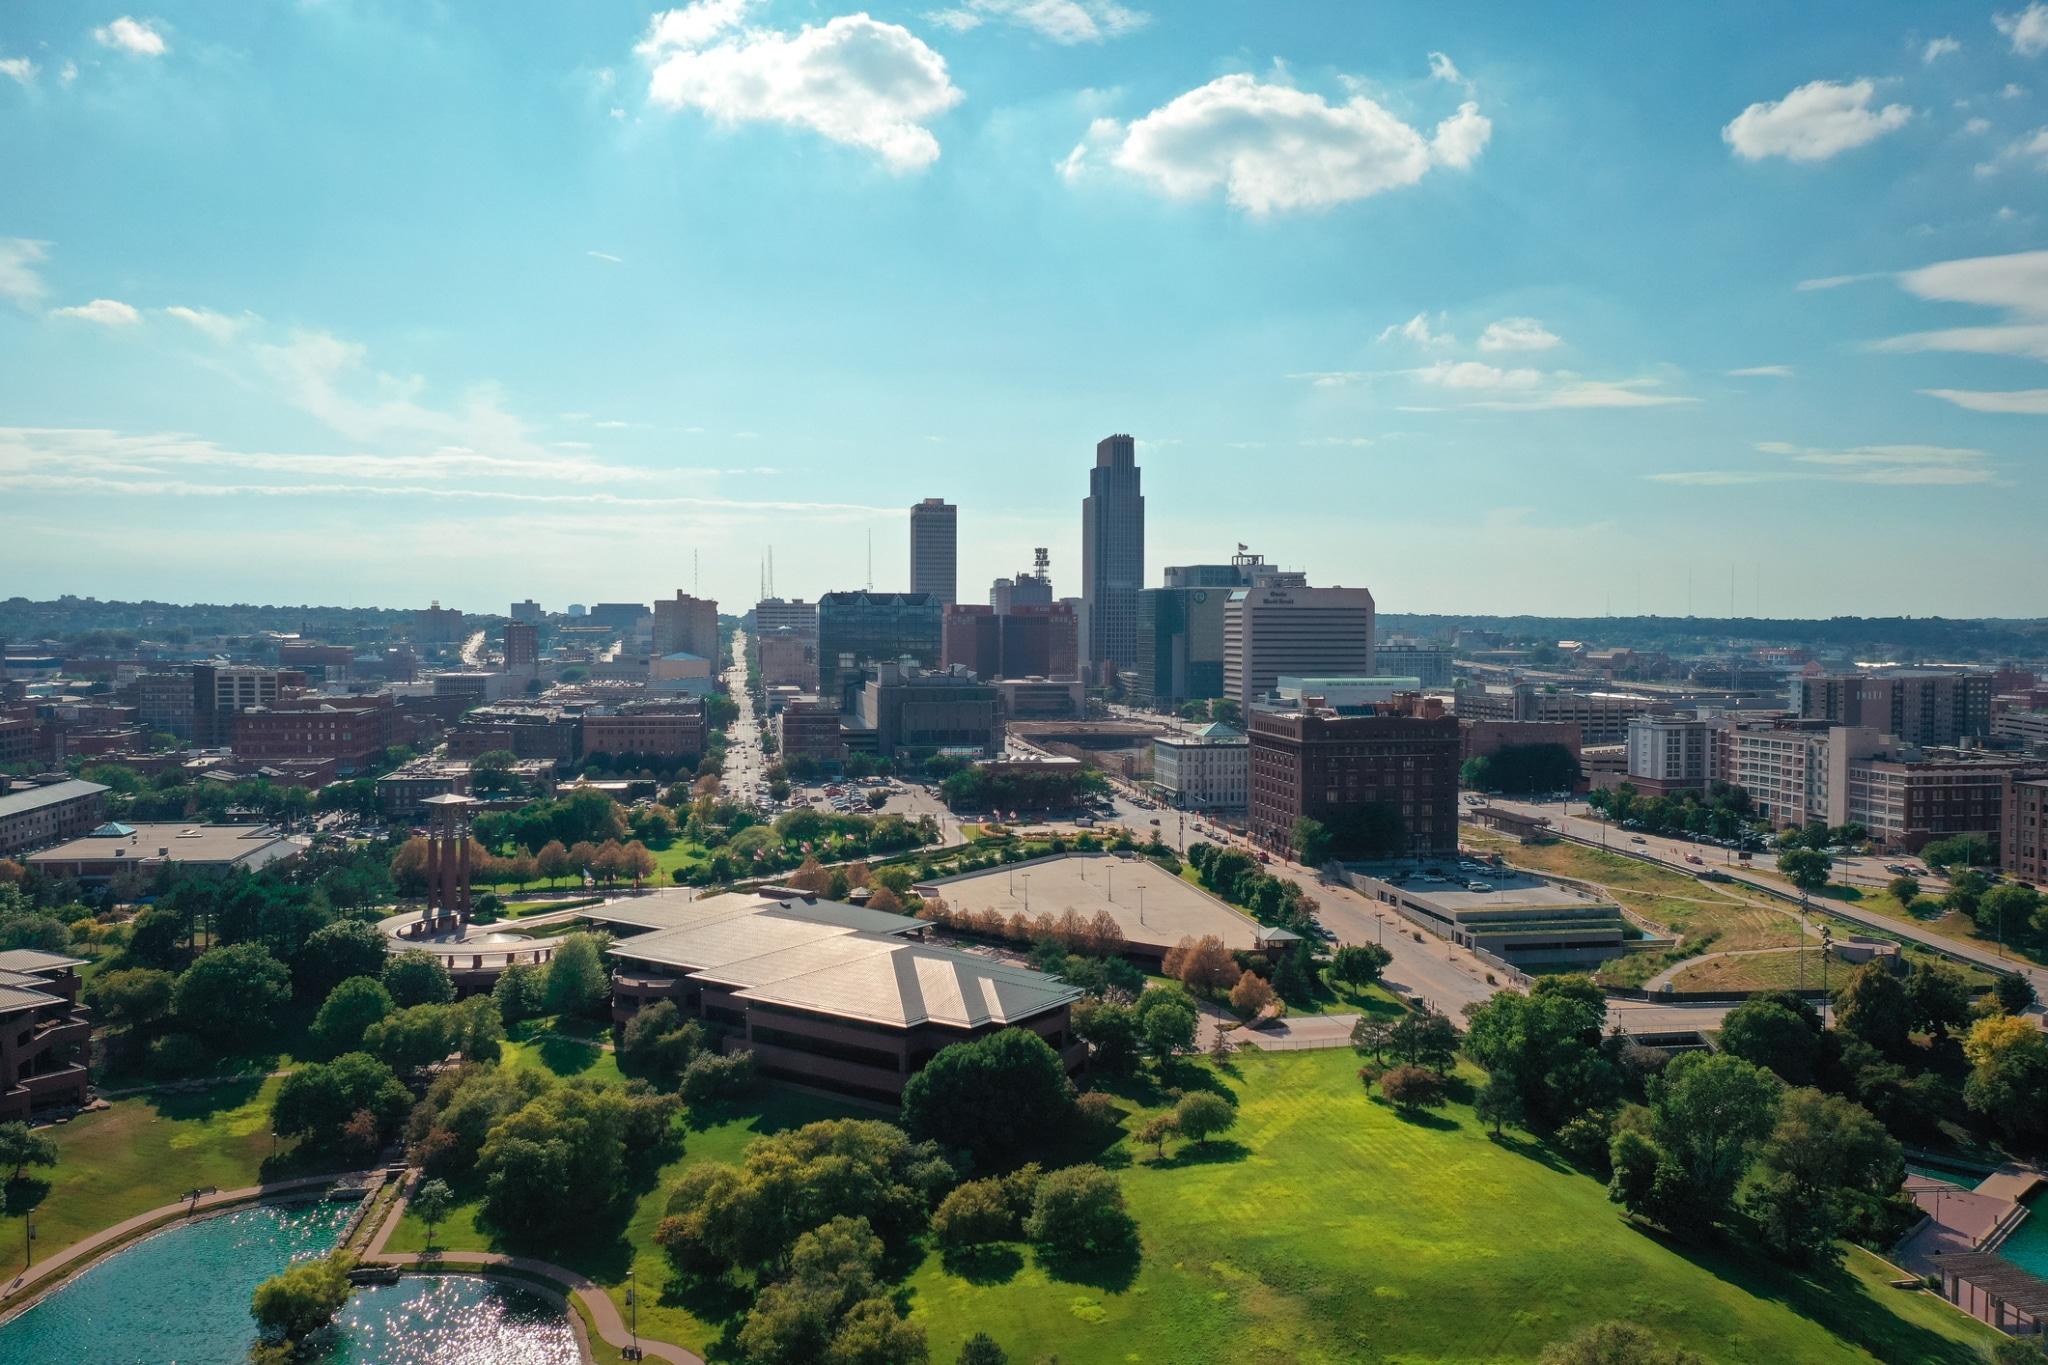 Aerial view of downtown Omaha Nebraska USA